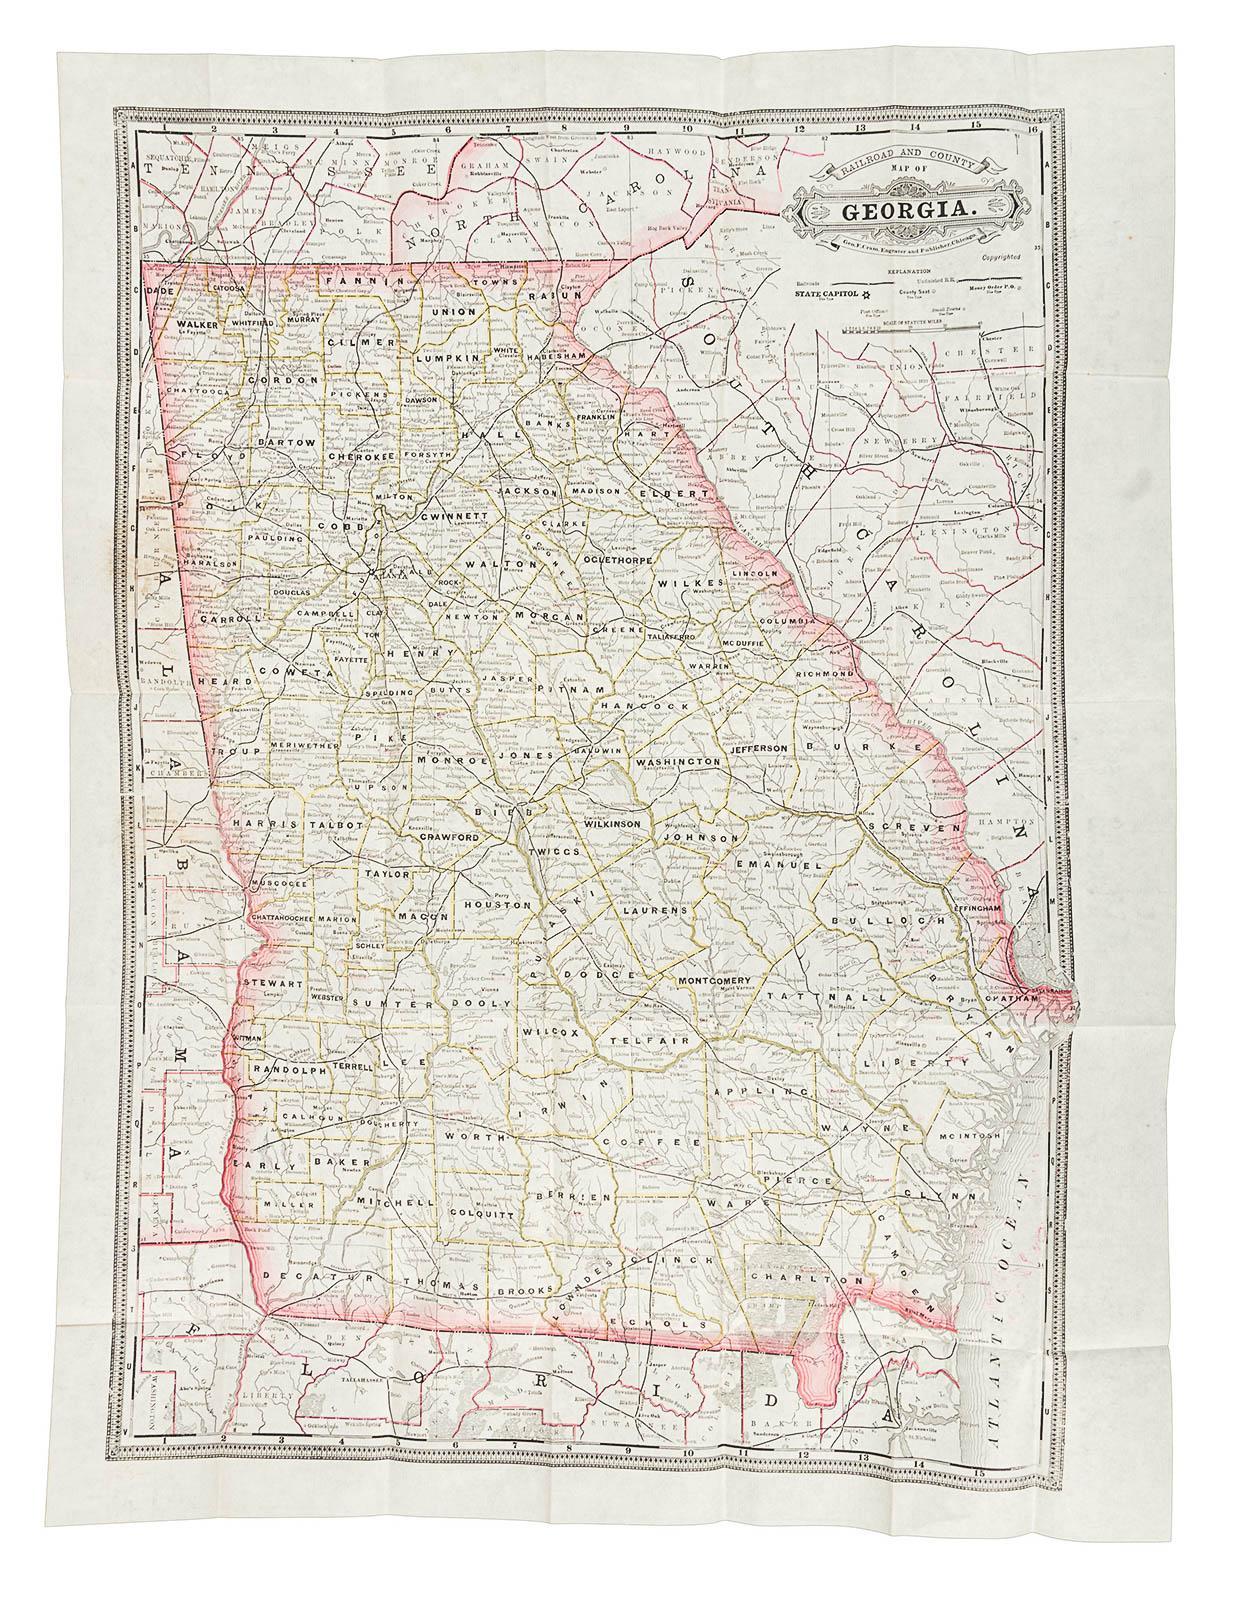 Railroad Map Of Georgia.Railroad And County Map Of Georgia Price Estimate 200 300